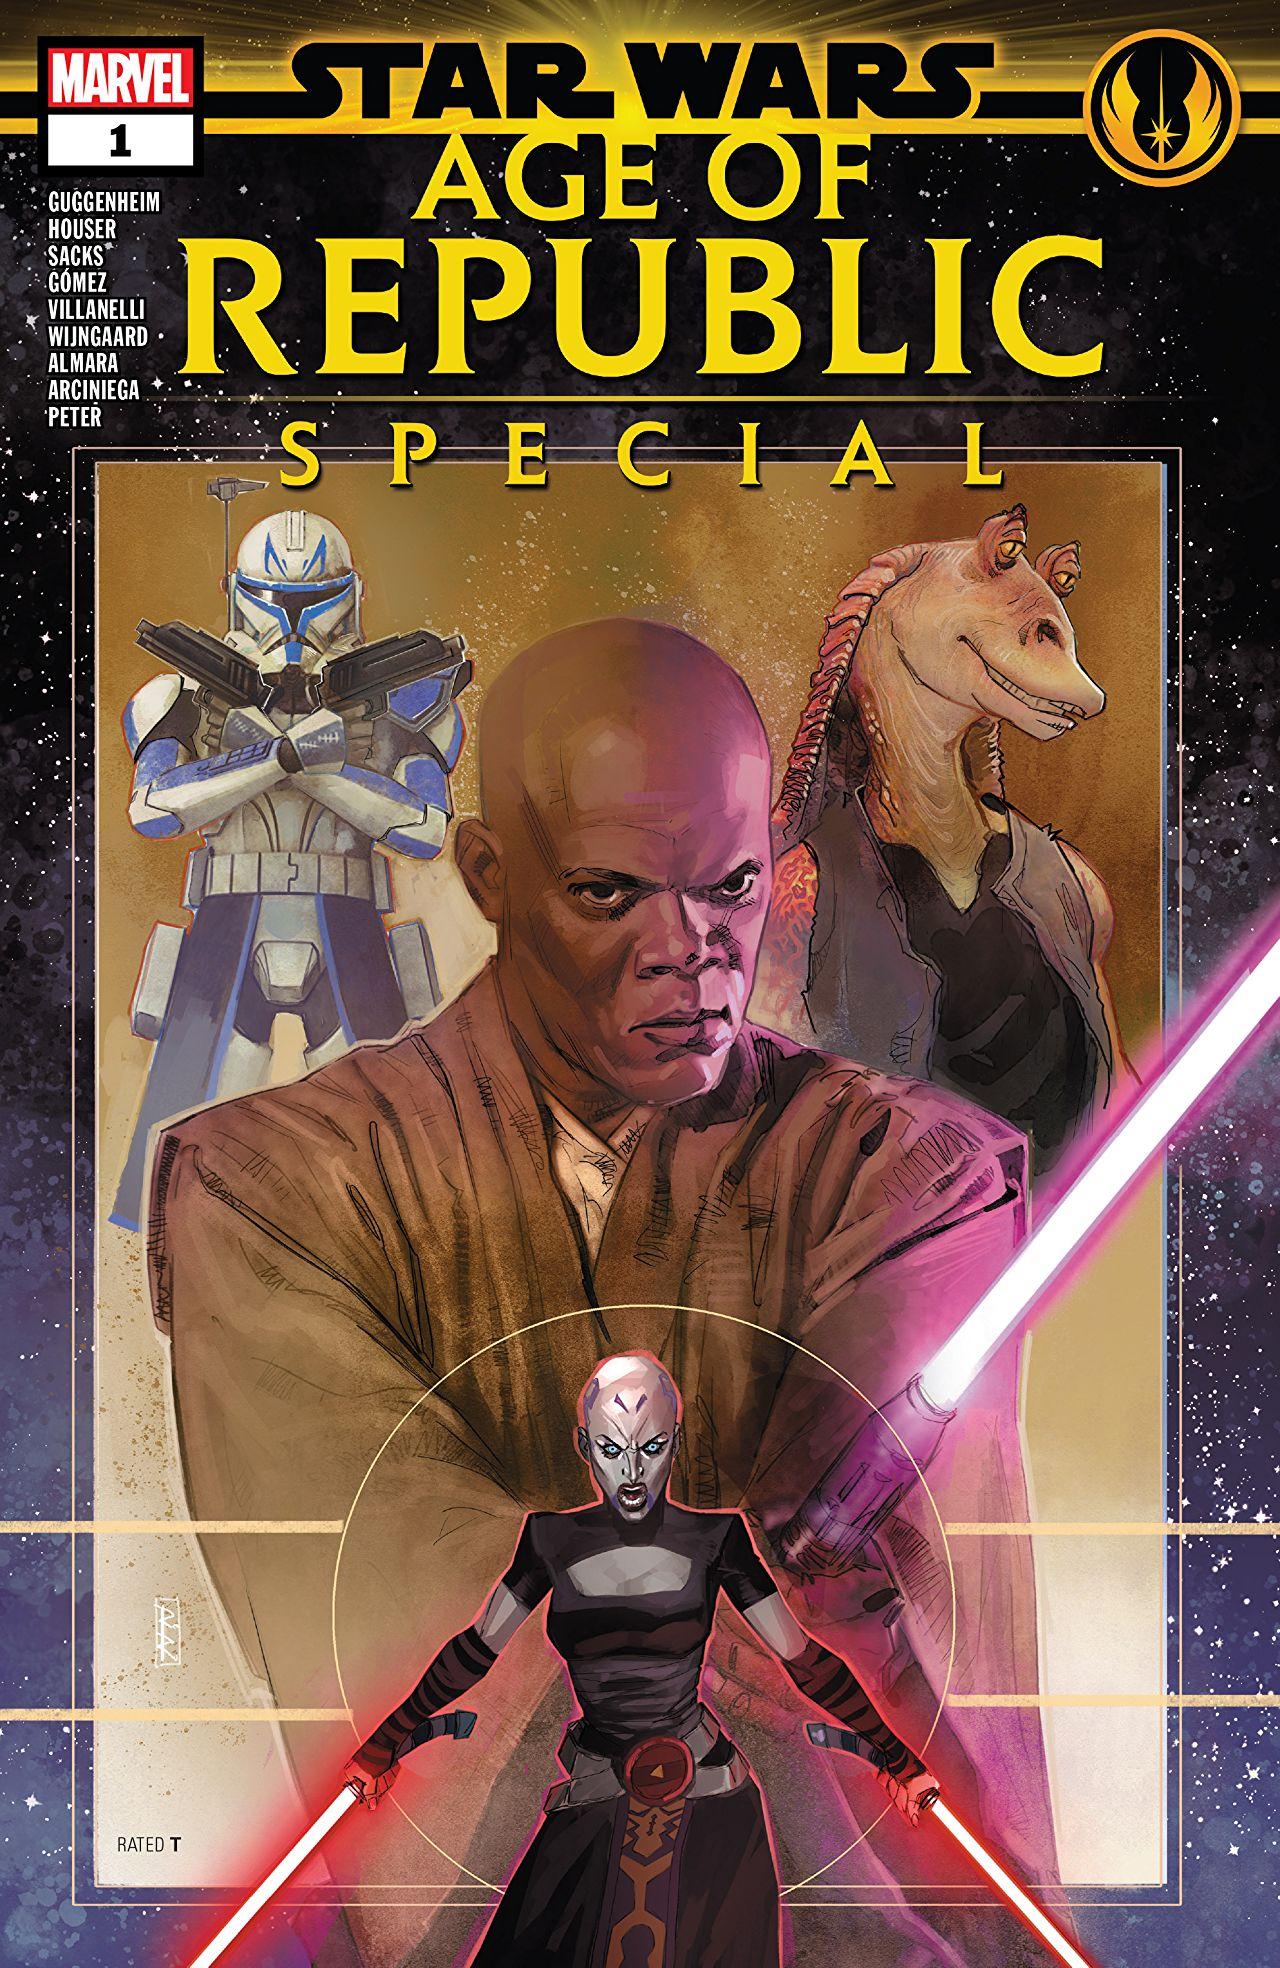 Star Wars: Age of Republic Special Vol 1 1